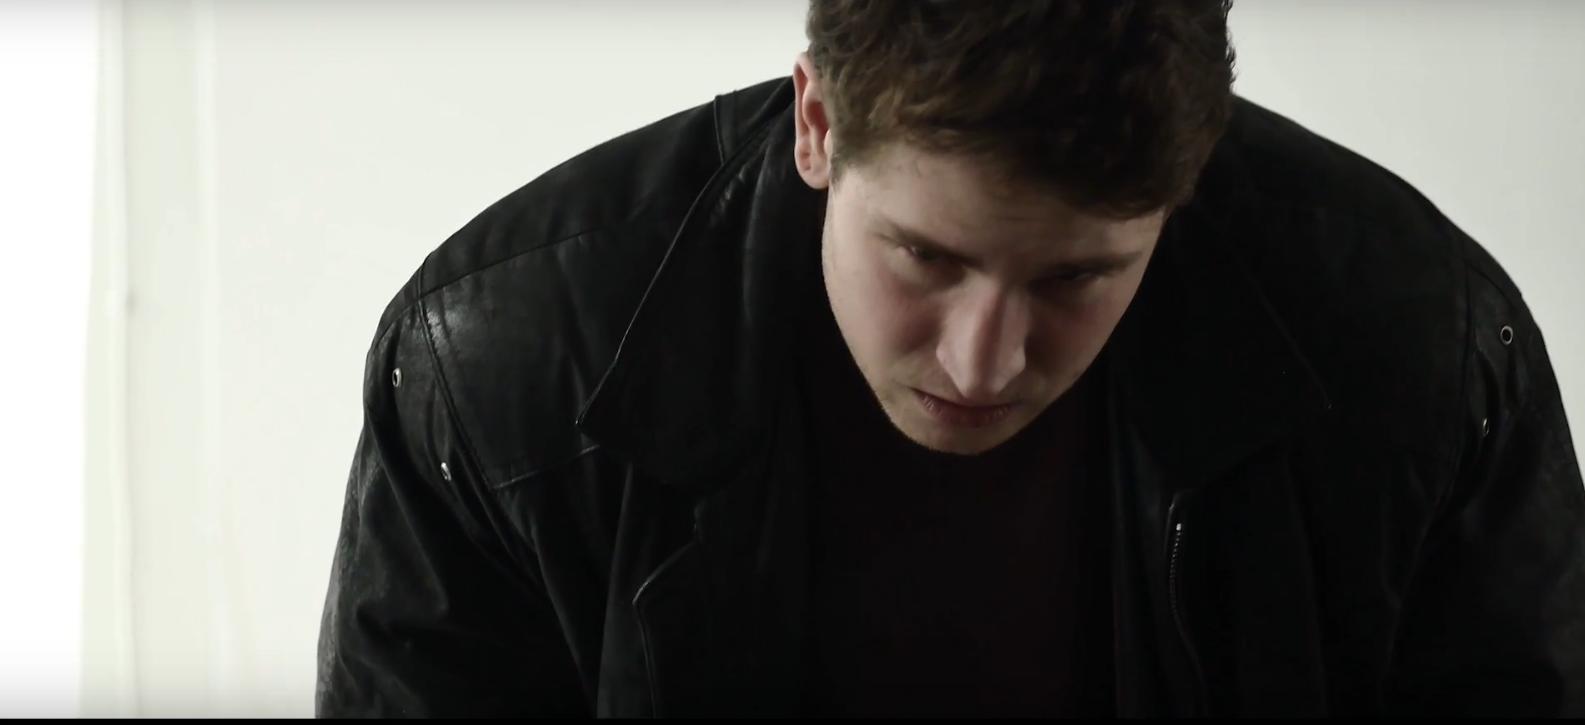 'The Clock' short film